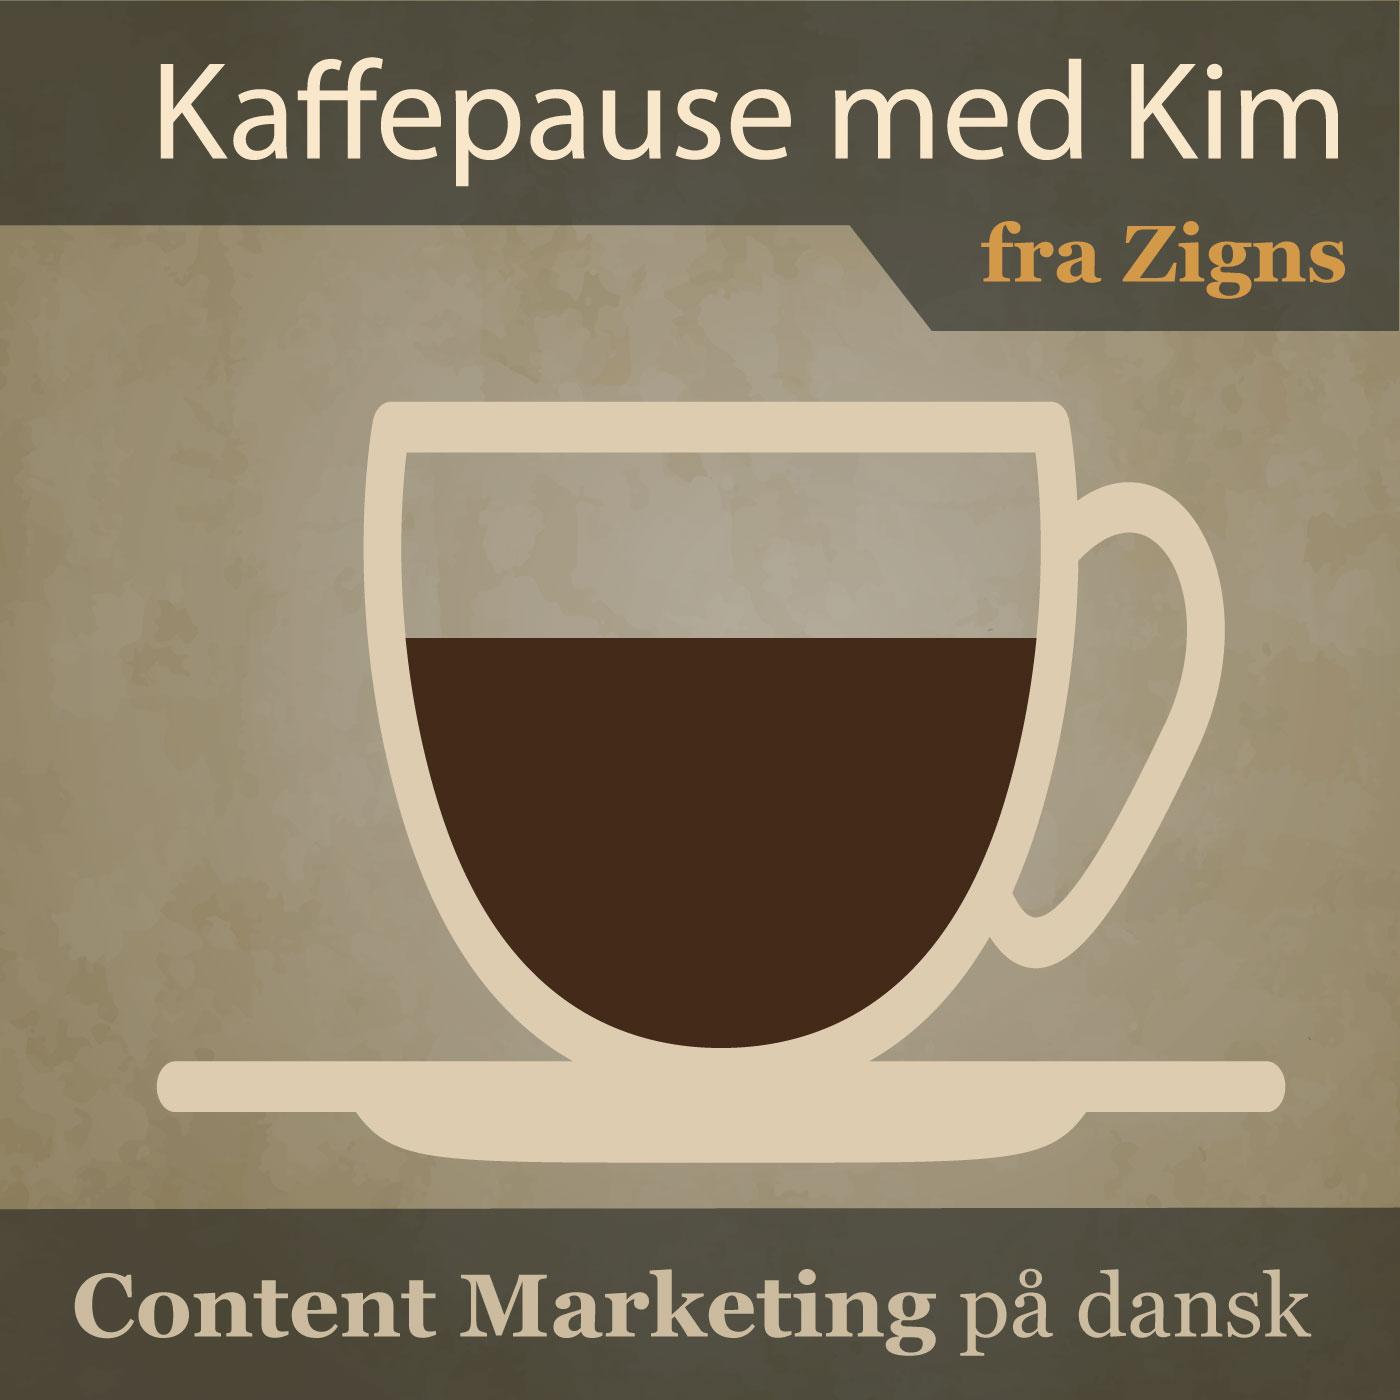 Kaffepause med Kim